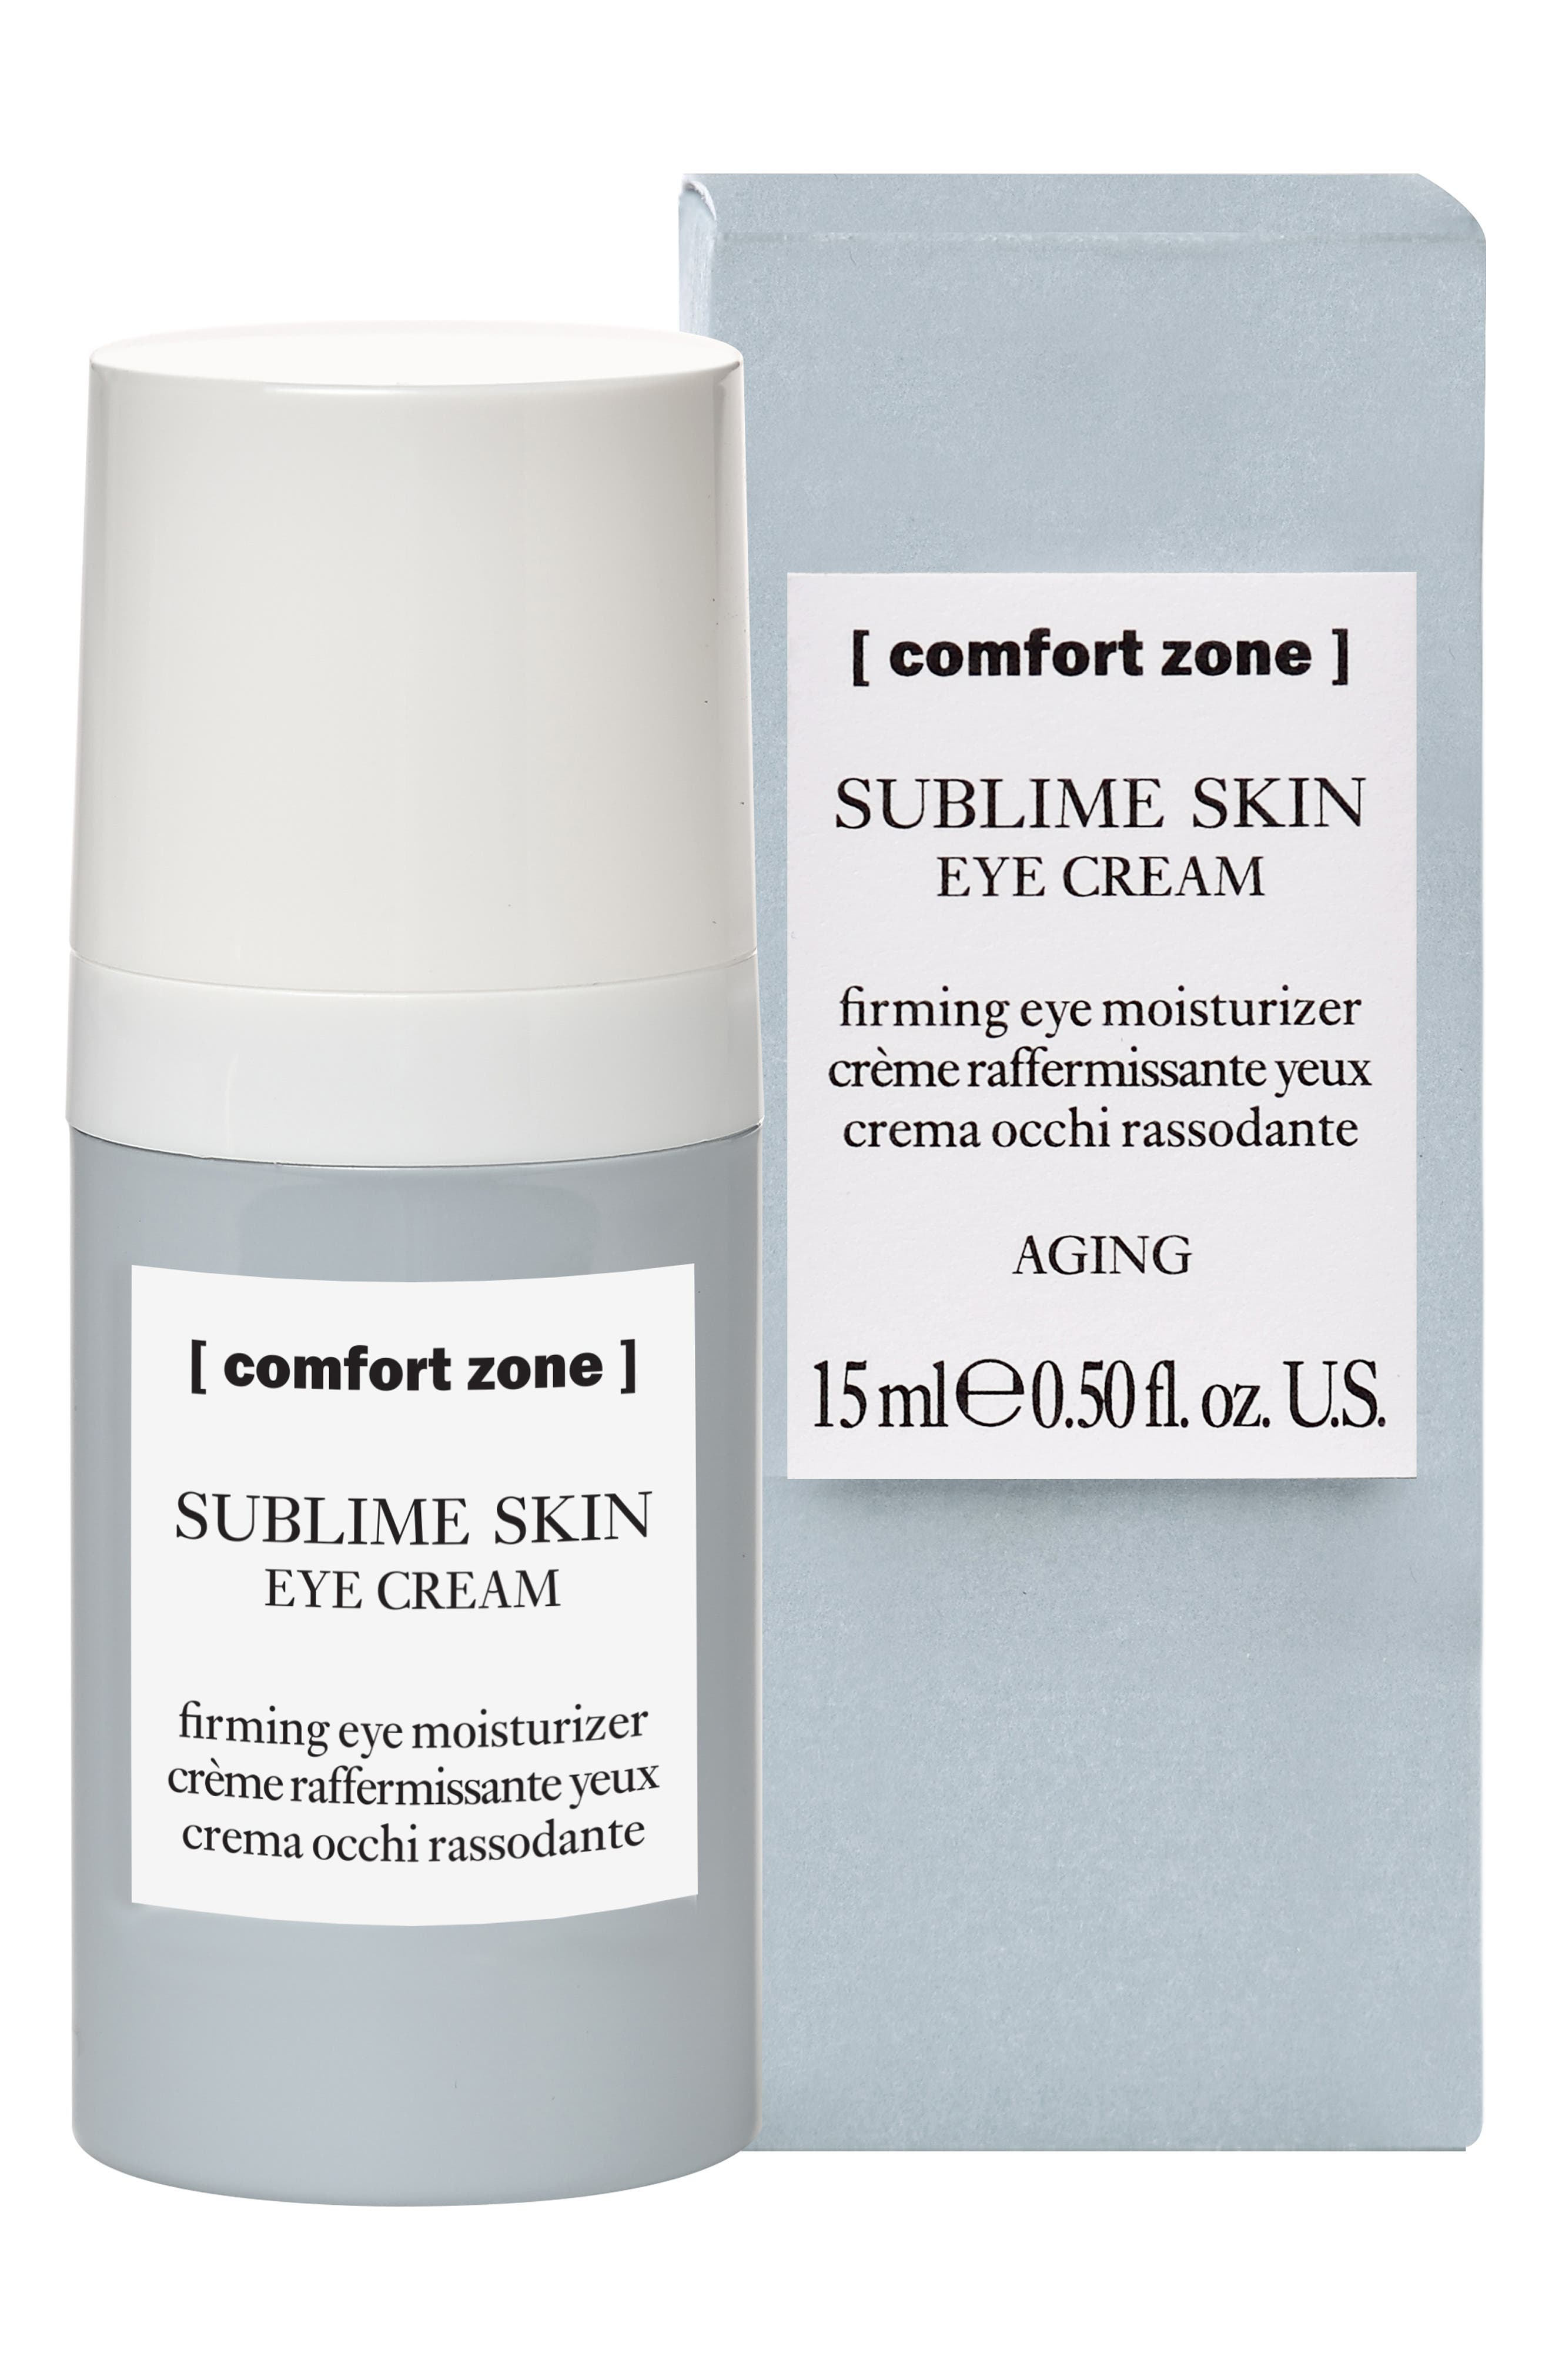 Sublime Skin Eye Cream